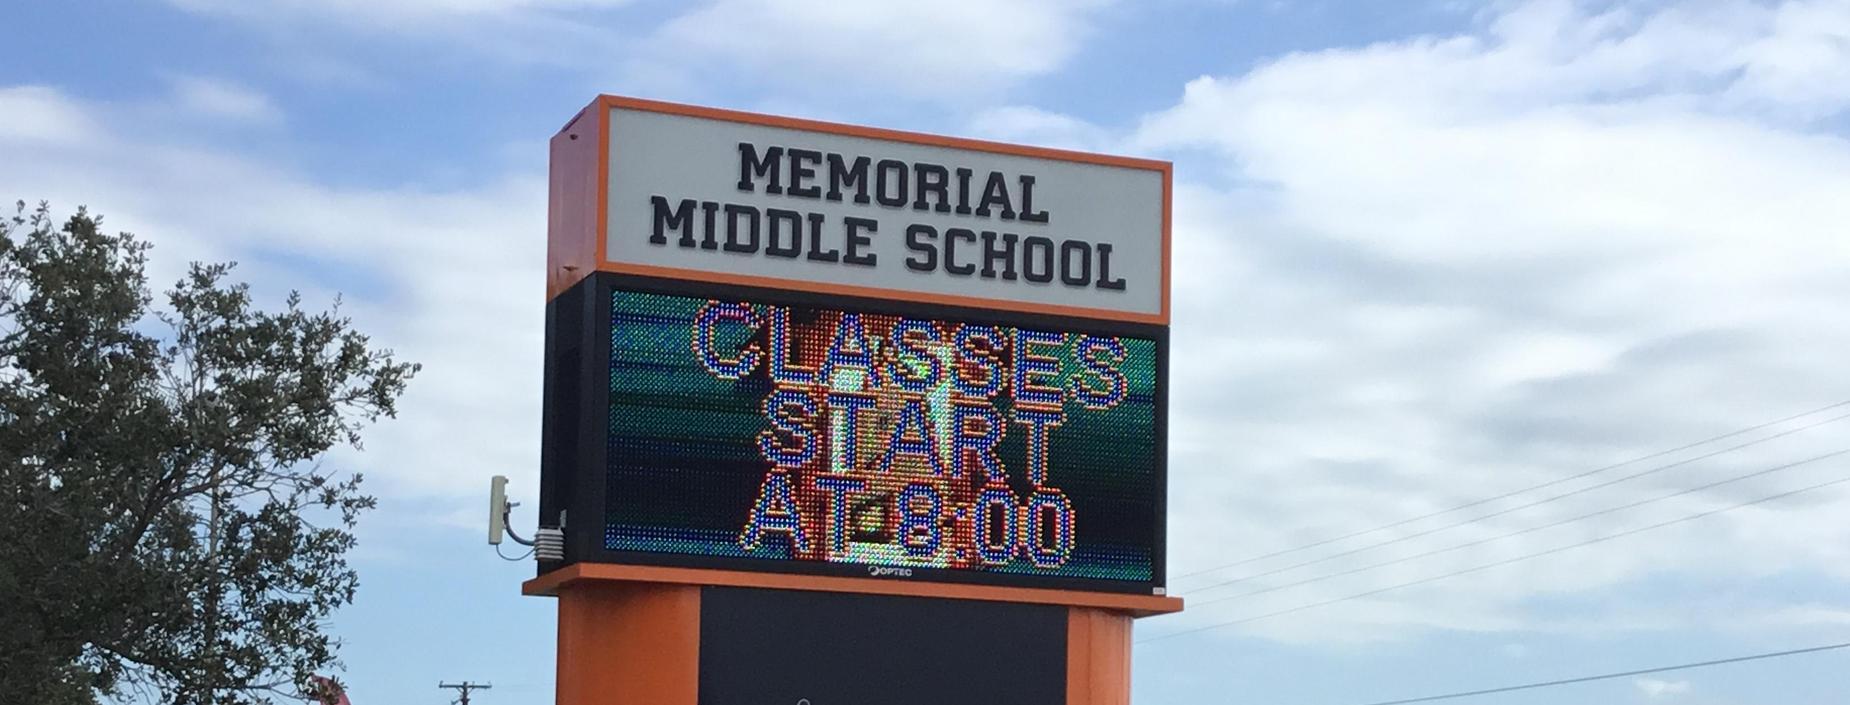 School starts at 8:00